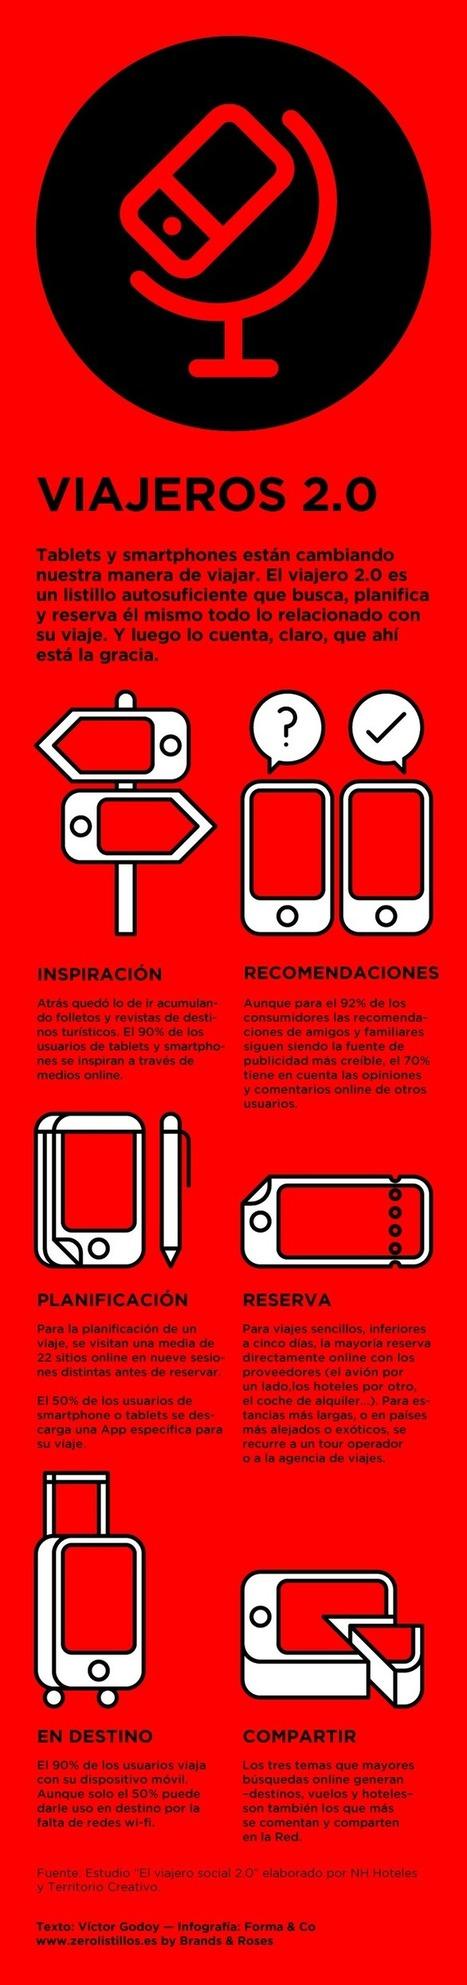 Cómo es el Viajero 2.0 #infografia #infographic #socialmedia #torurism   Estrategias Competitivas en Turismo:   Scoop.it